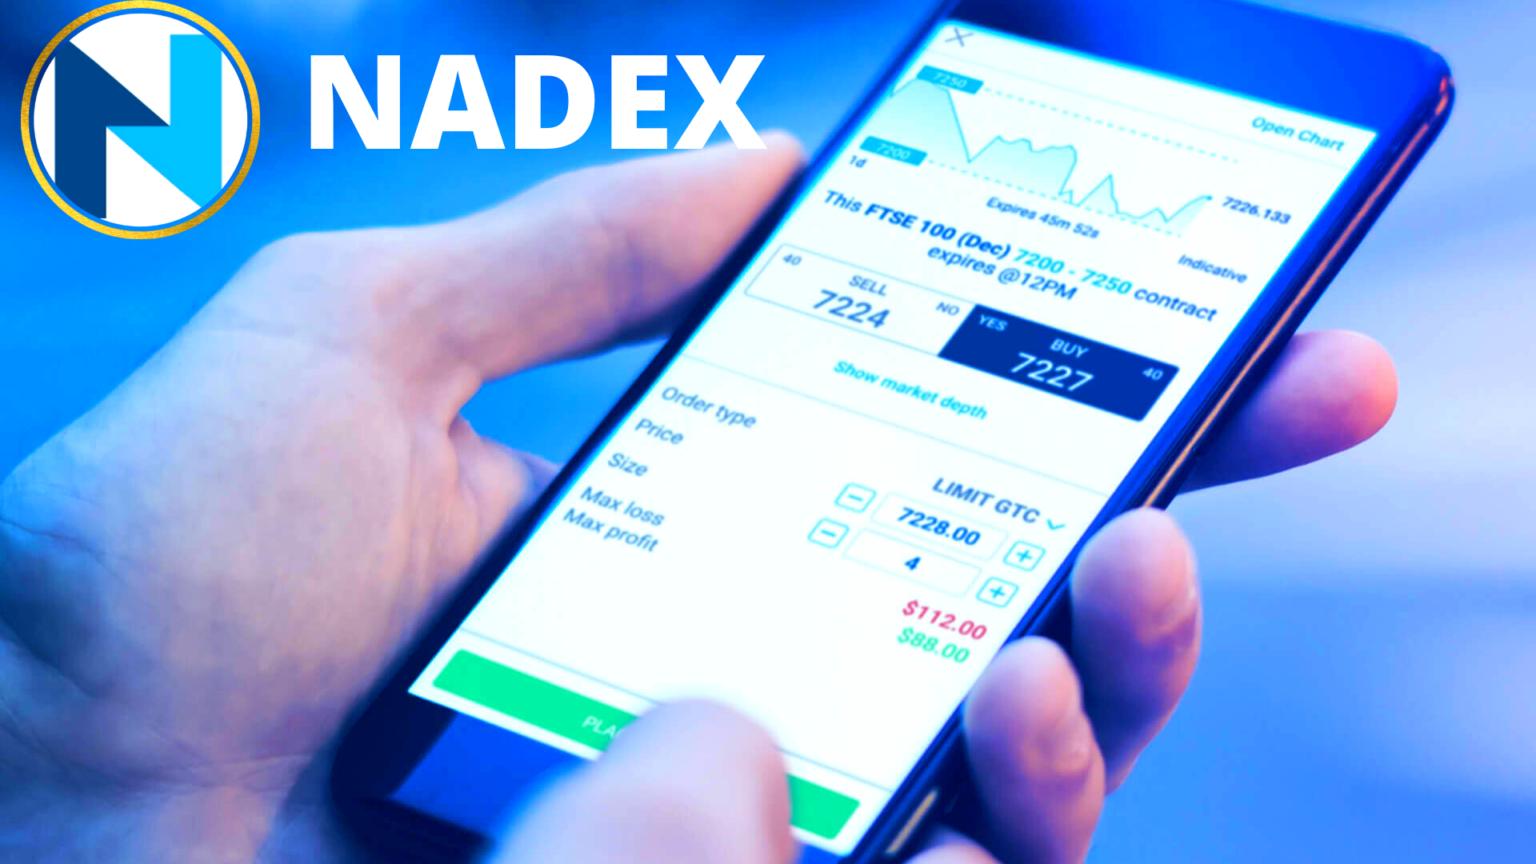 Nadex Forex Contract Specs